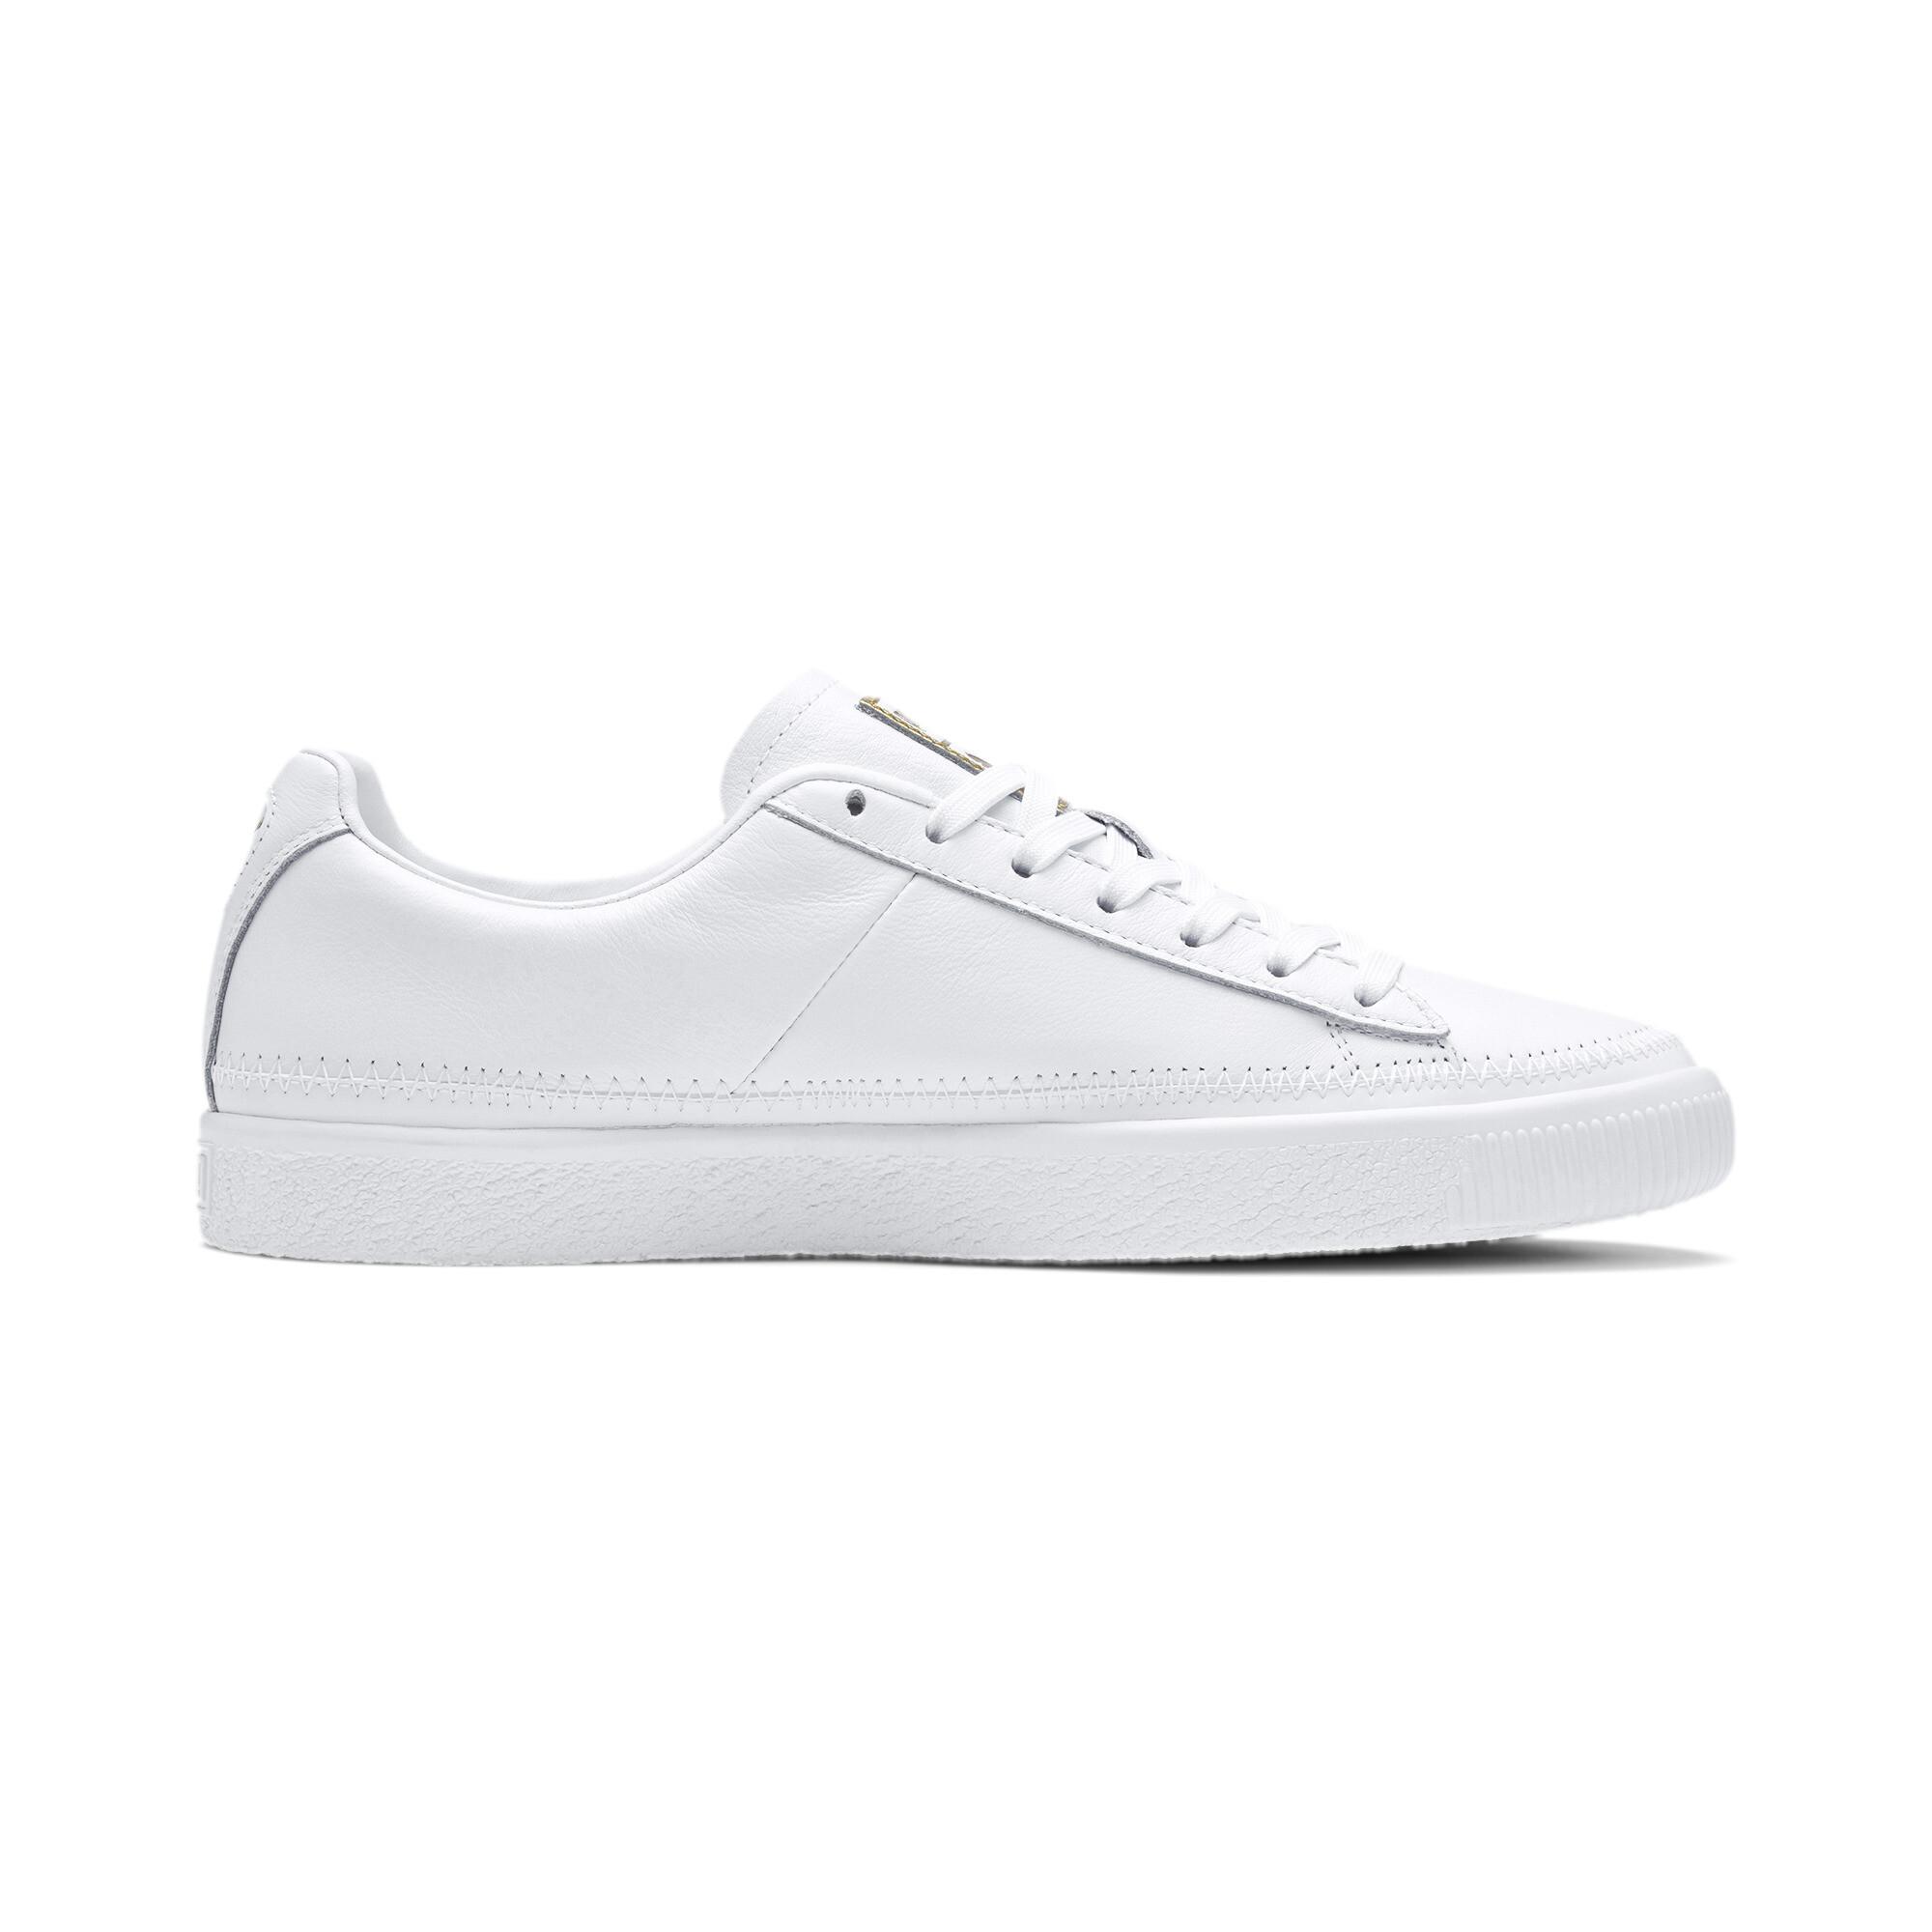 PUMA-Basket-Stitch-Sneaker-Unisex-Schuhe-Neu Indexbild 6